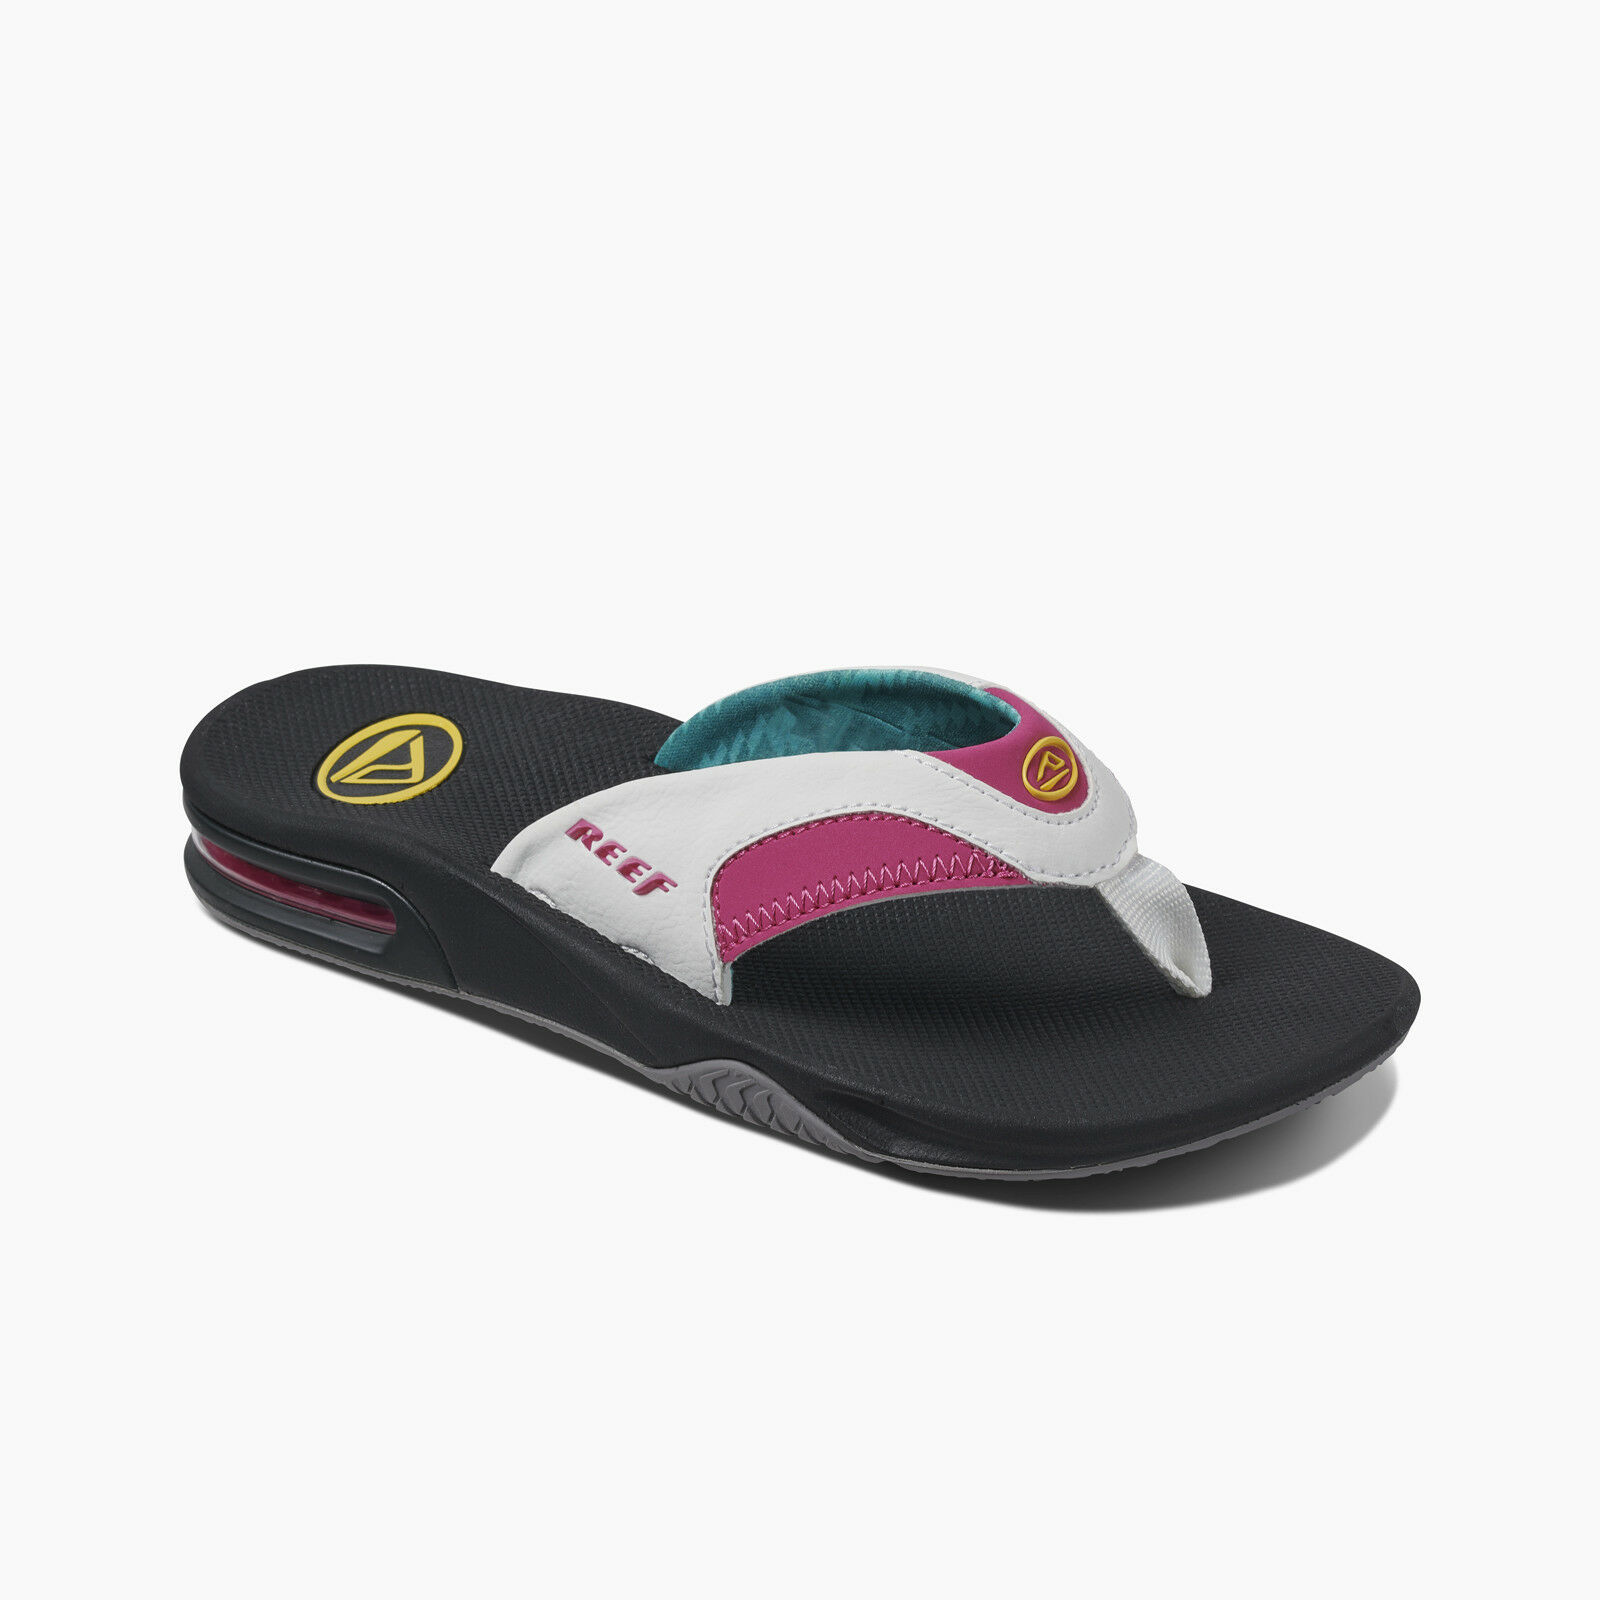 Reef Femme Flip Flops. Fanning Arch Support water friendly Sandal Tongs 9 S 26 B